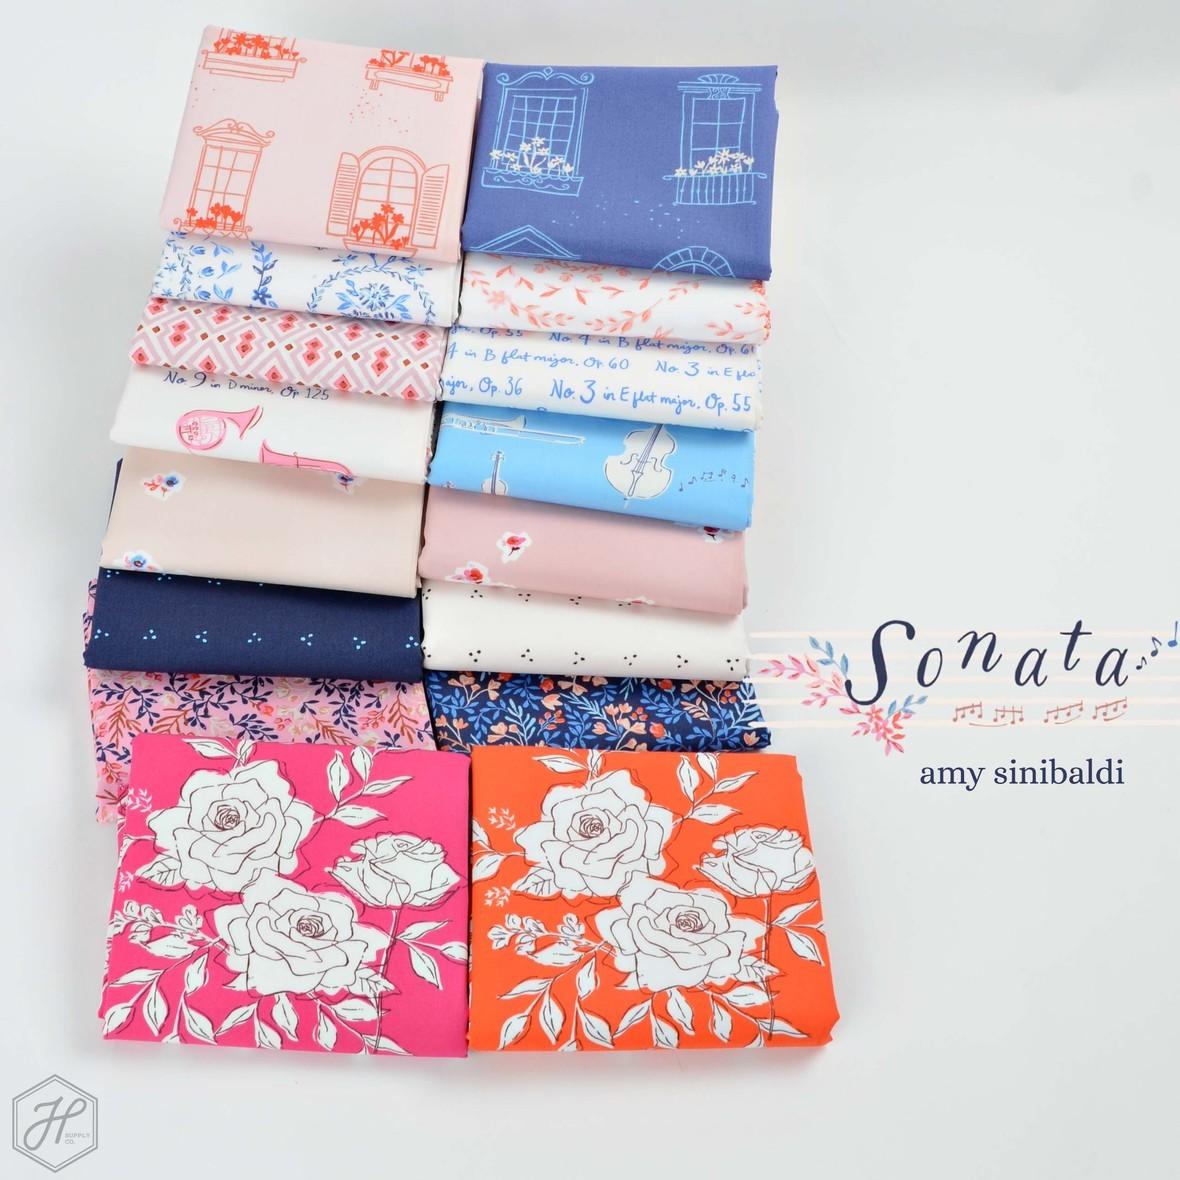 Sonata Fabric Poster Amy Sinibaldi for Art Gallery at Hawthorne Supply Co